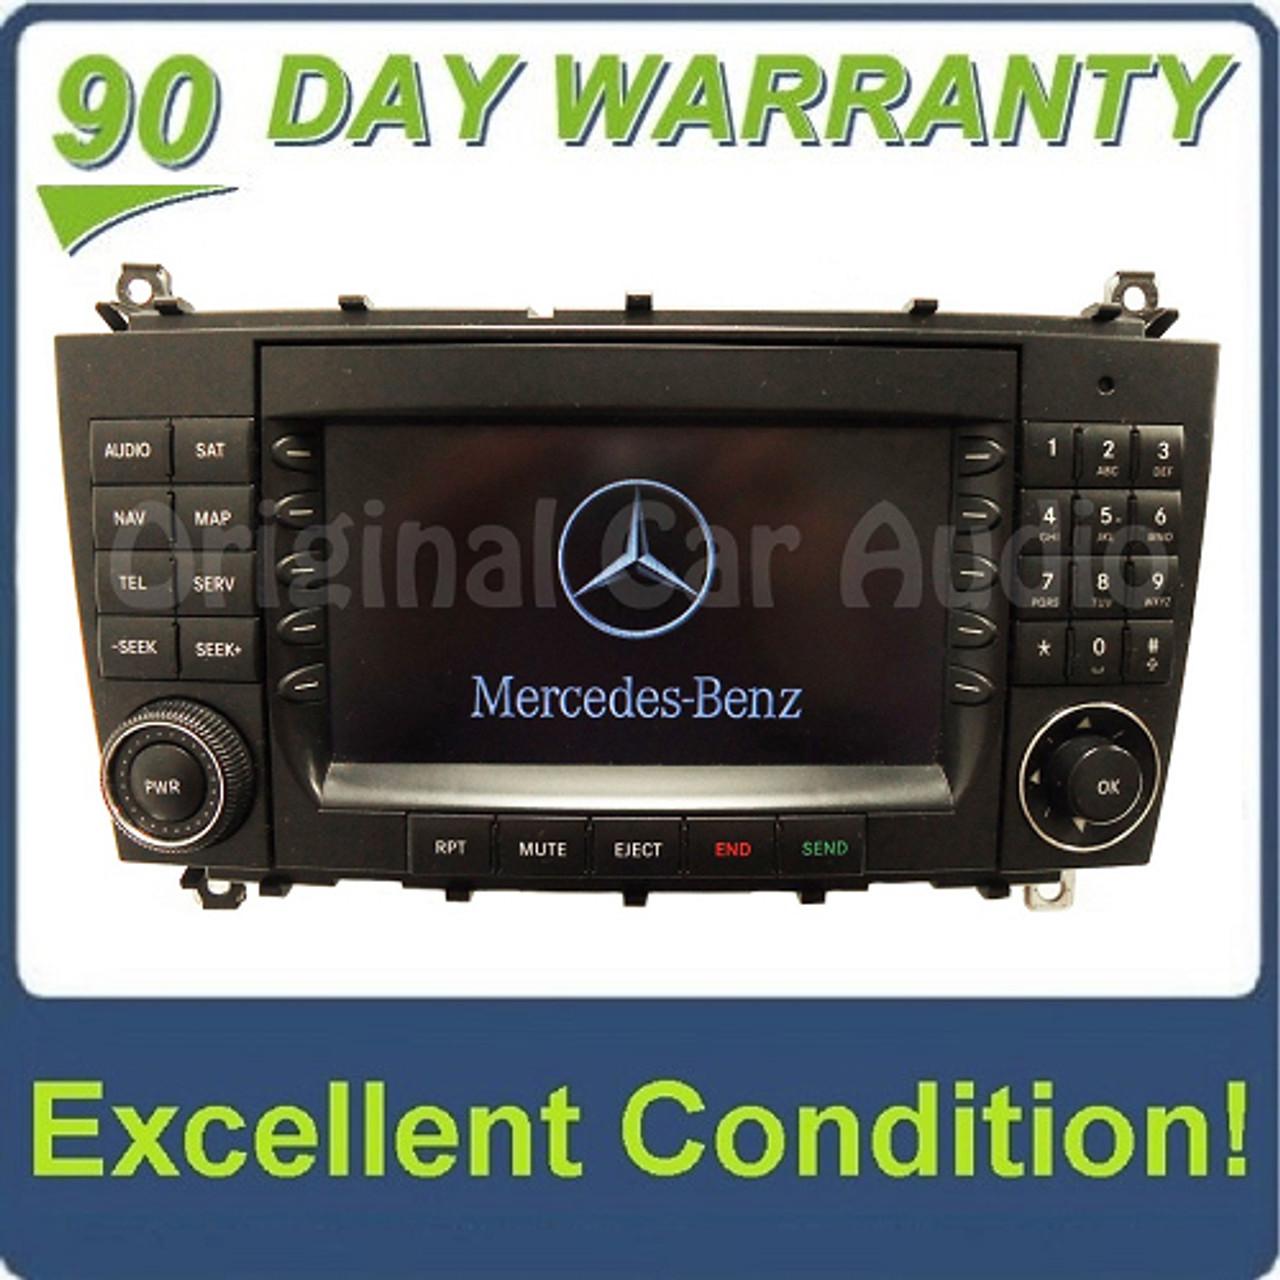 2005 2006 2007 Mercedes-Benz C Class OEM Comand Navigation Radio CD Player  TYPE 203